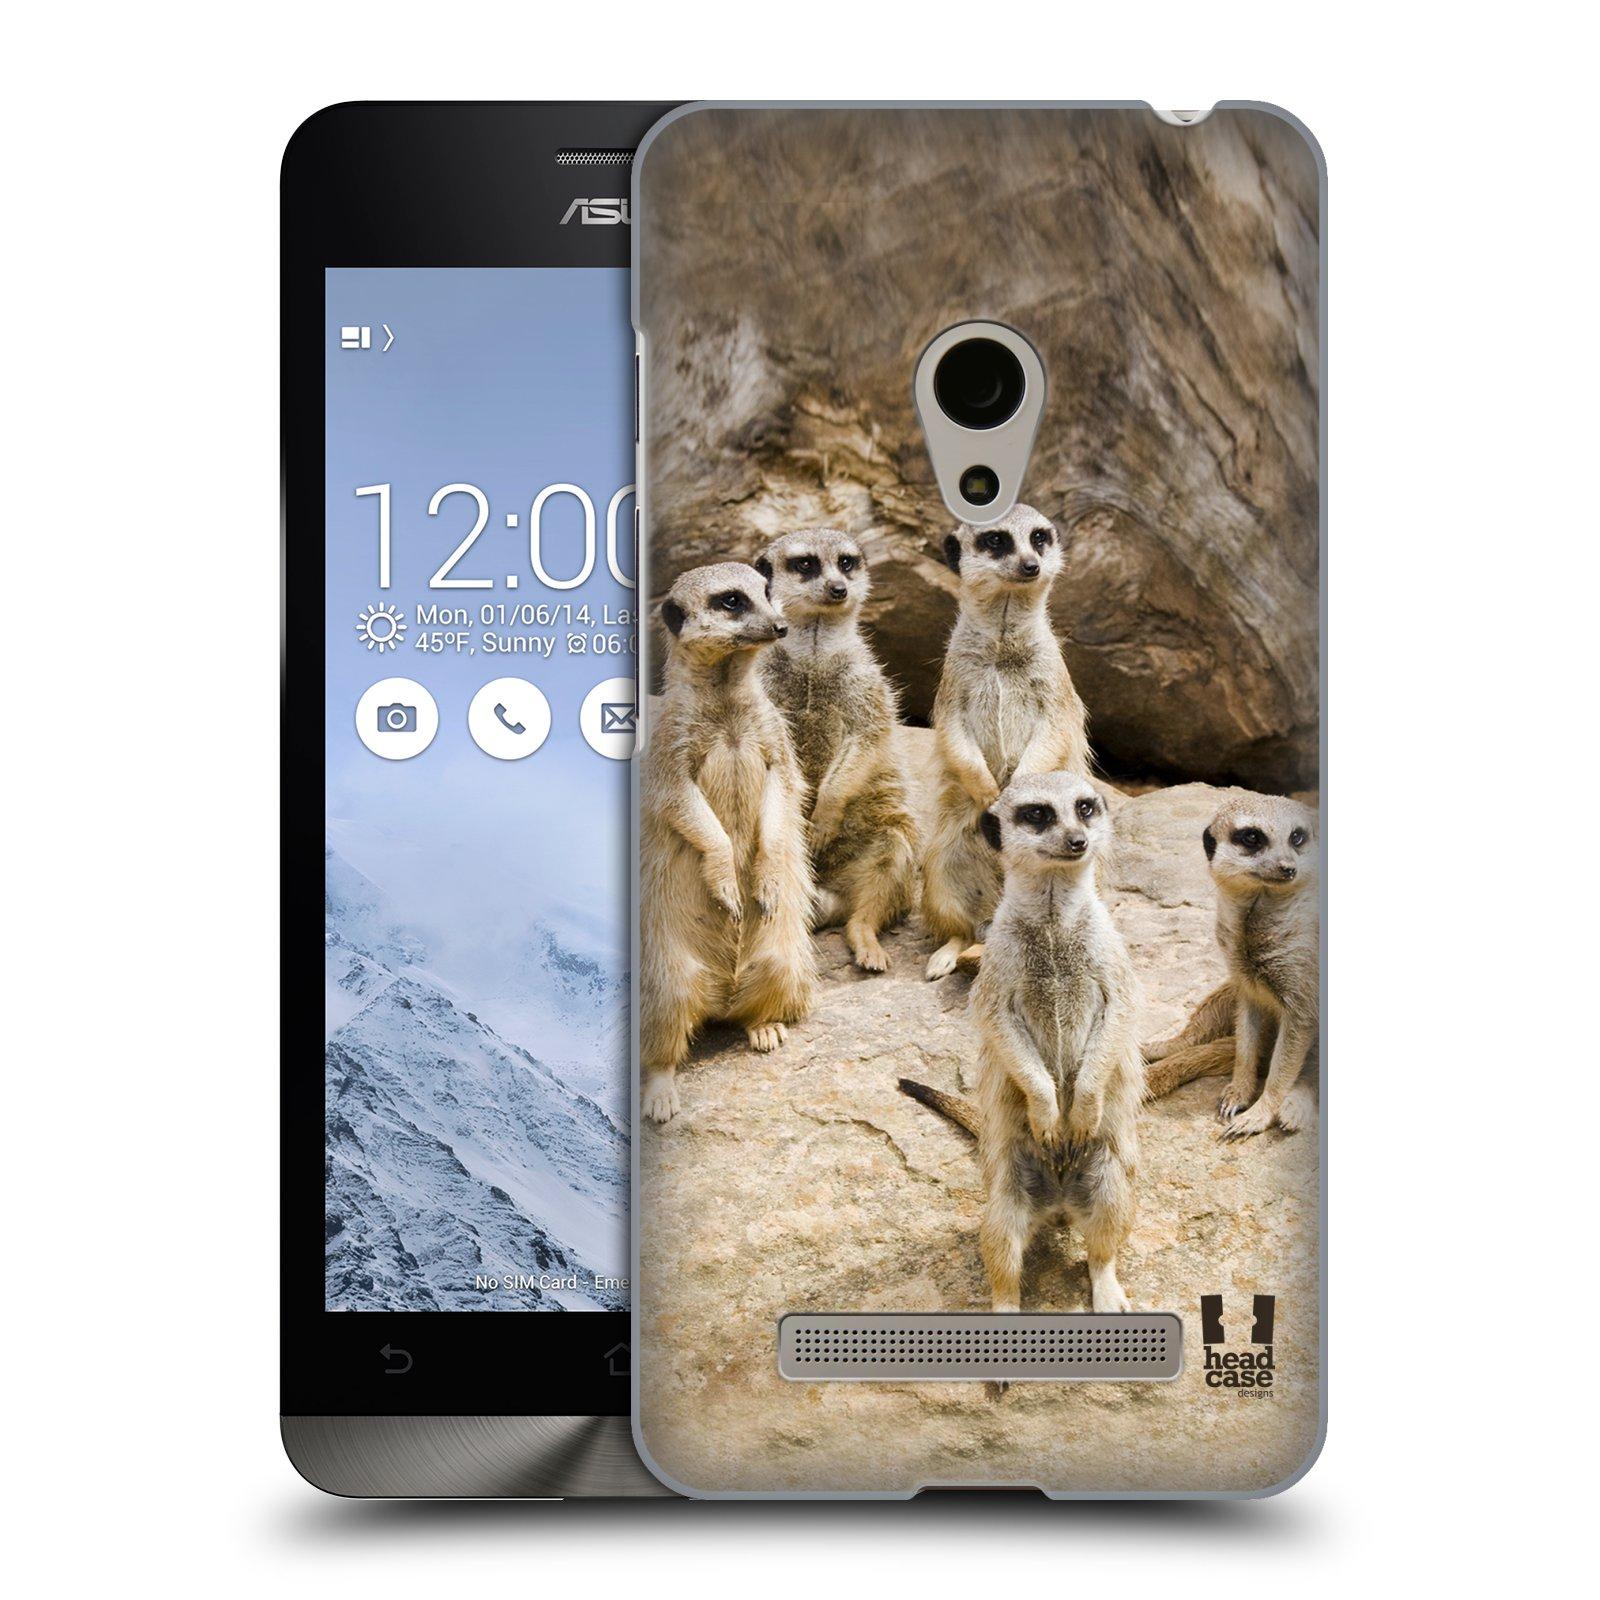 HEAD CASE plastový obal na mobil Asus Zenfone 5 vzor Divočina, Divoký život a zvířata foto SURIKATA